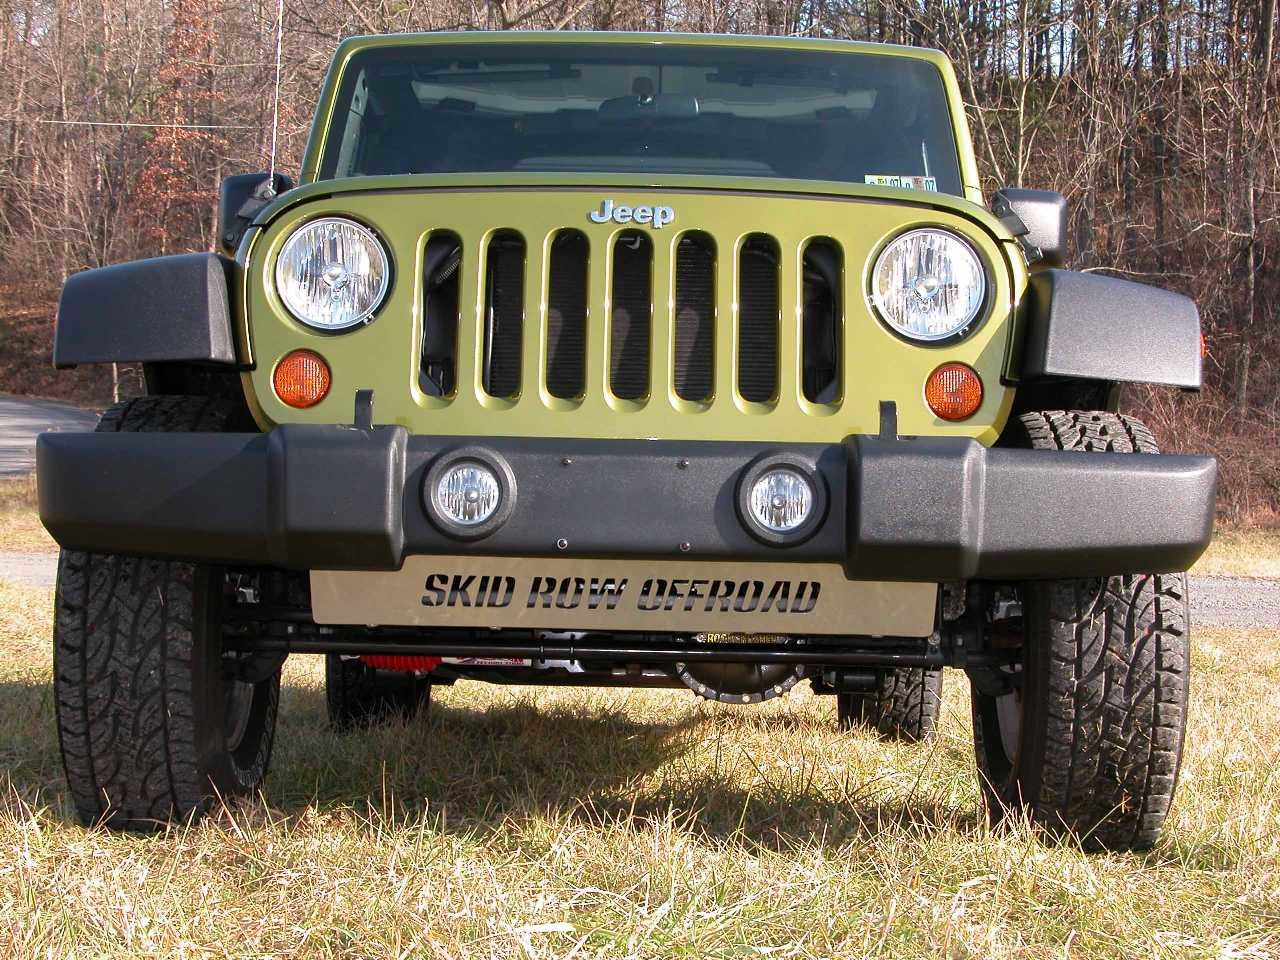 2015 Options Grand Jeep Cherokee